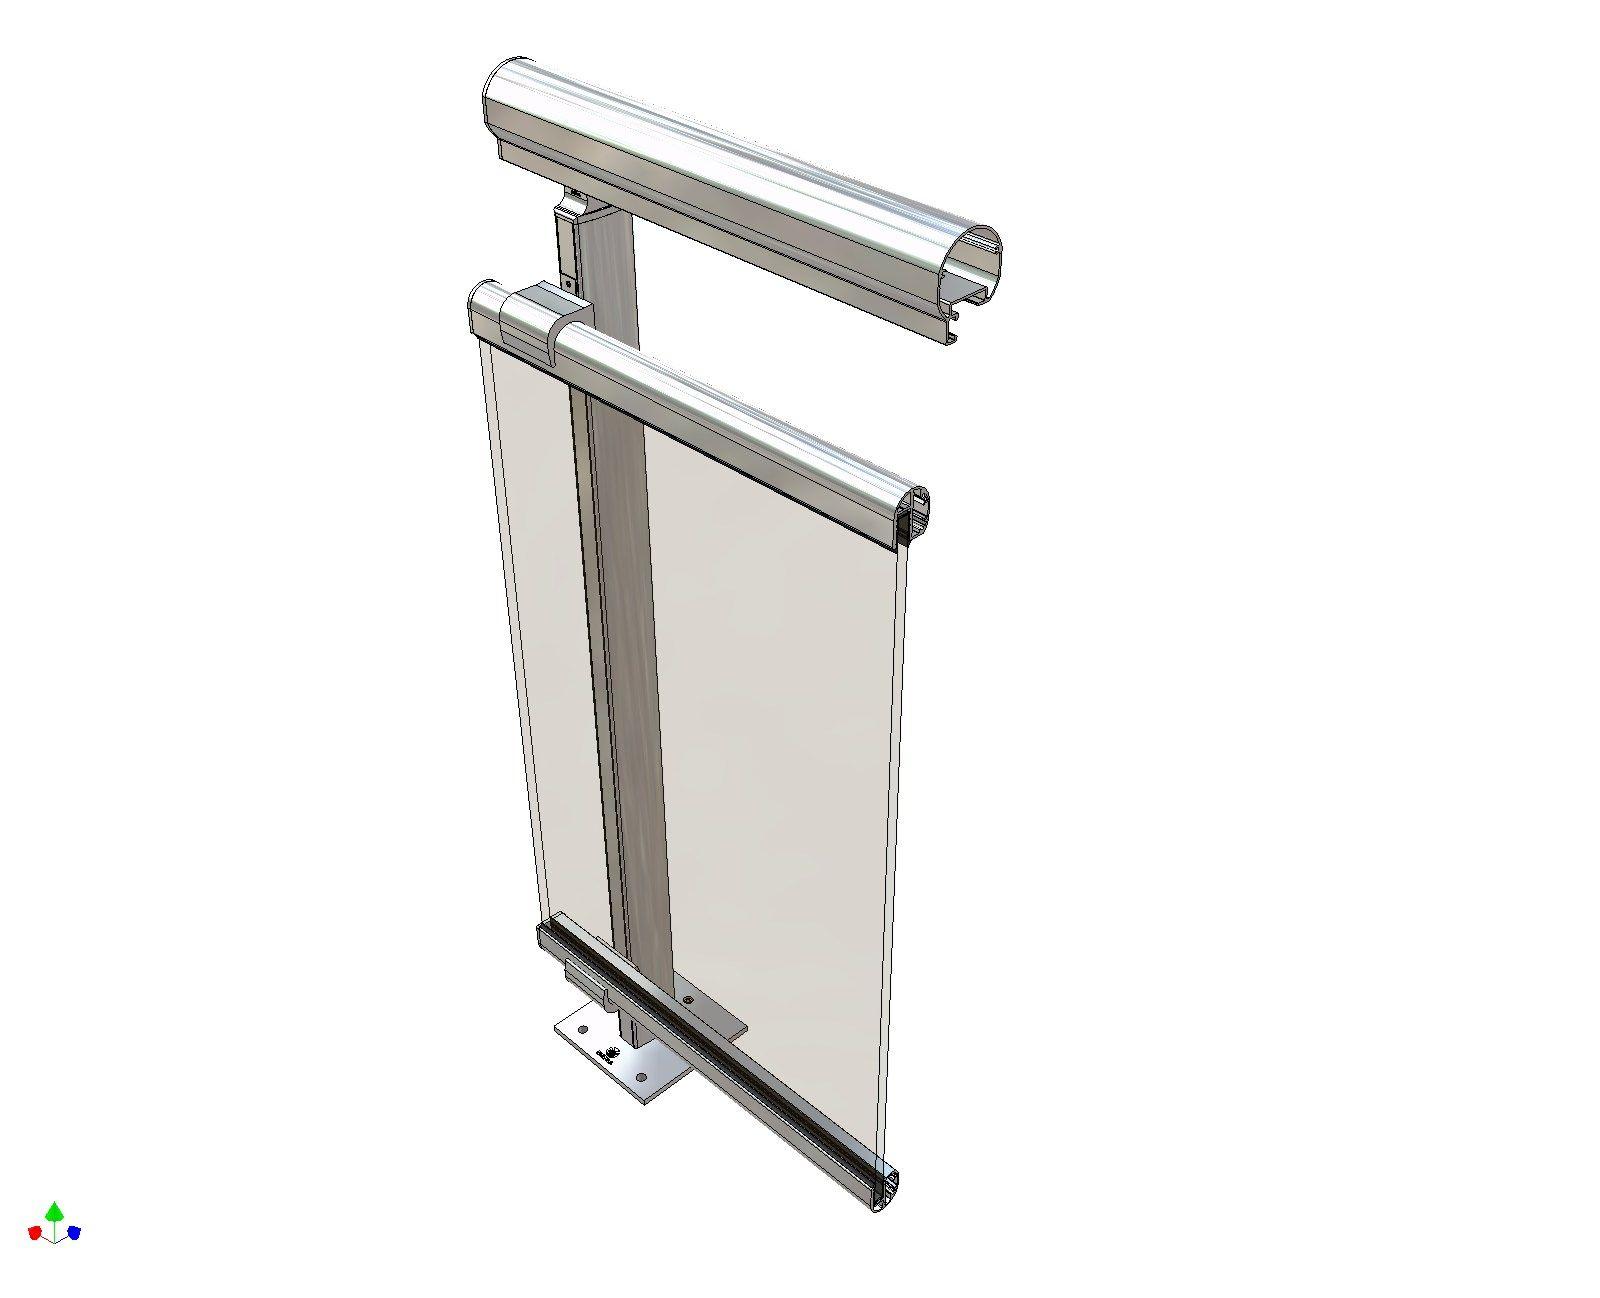 garde corps en aluminium et verre pour terrasse balcon theatron by metra. Black Bedroom Furniture Sets. Home Design Ideas